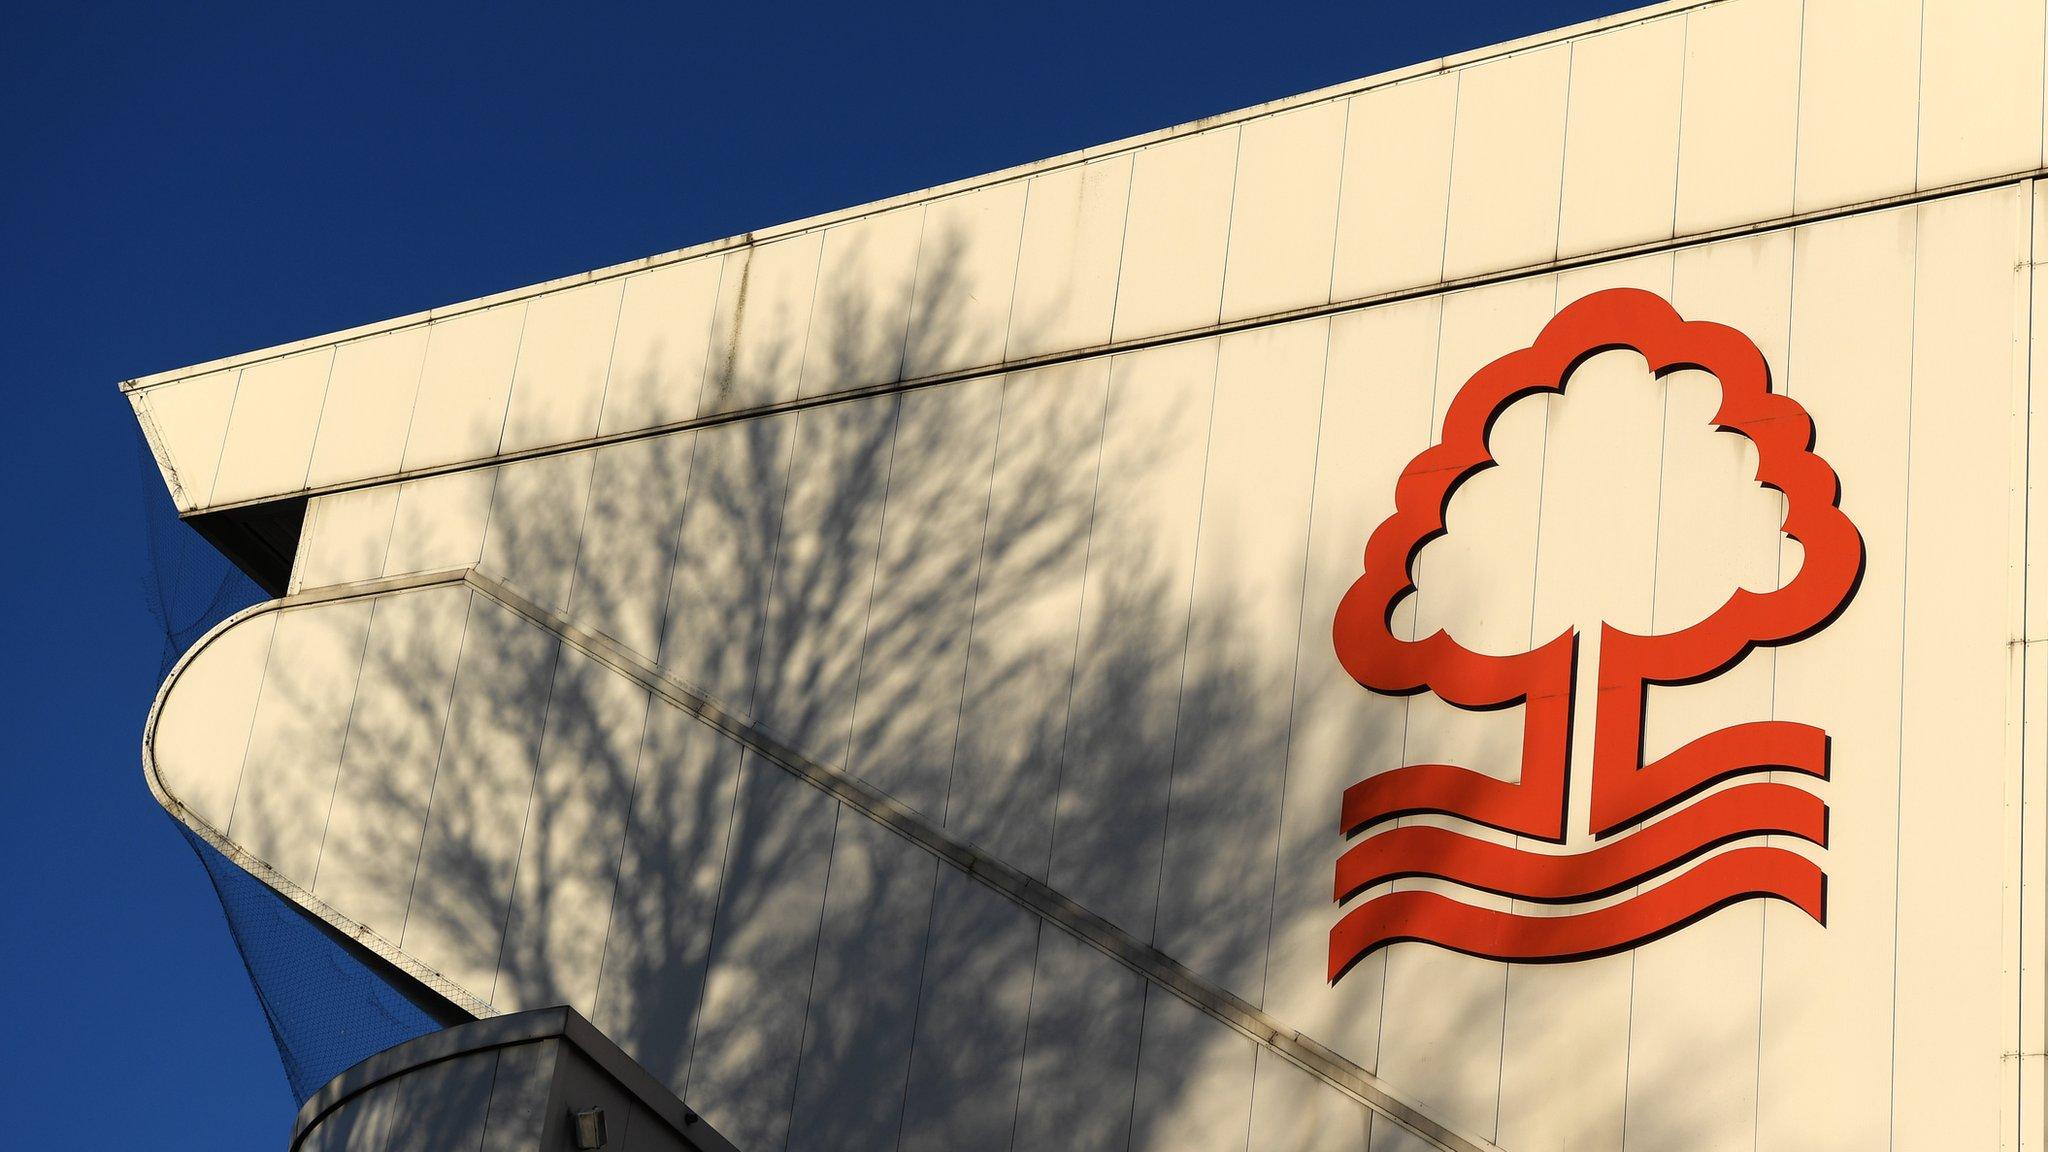 Nottingham Forest: Kyriakos Dourekas made director of football of Championship side